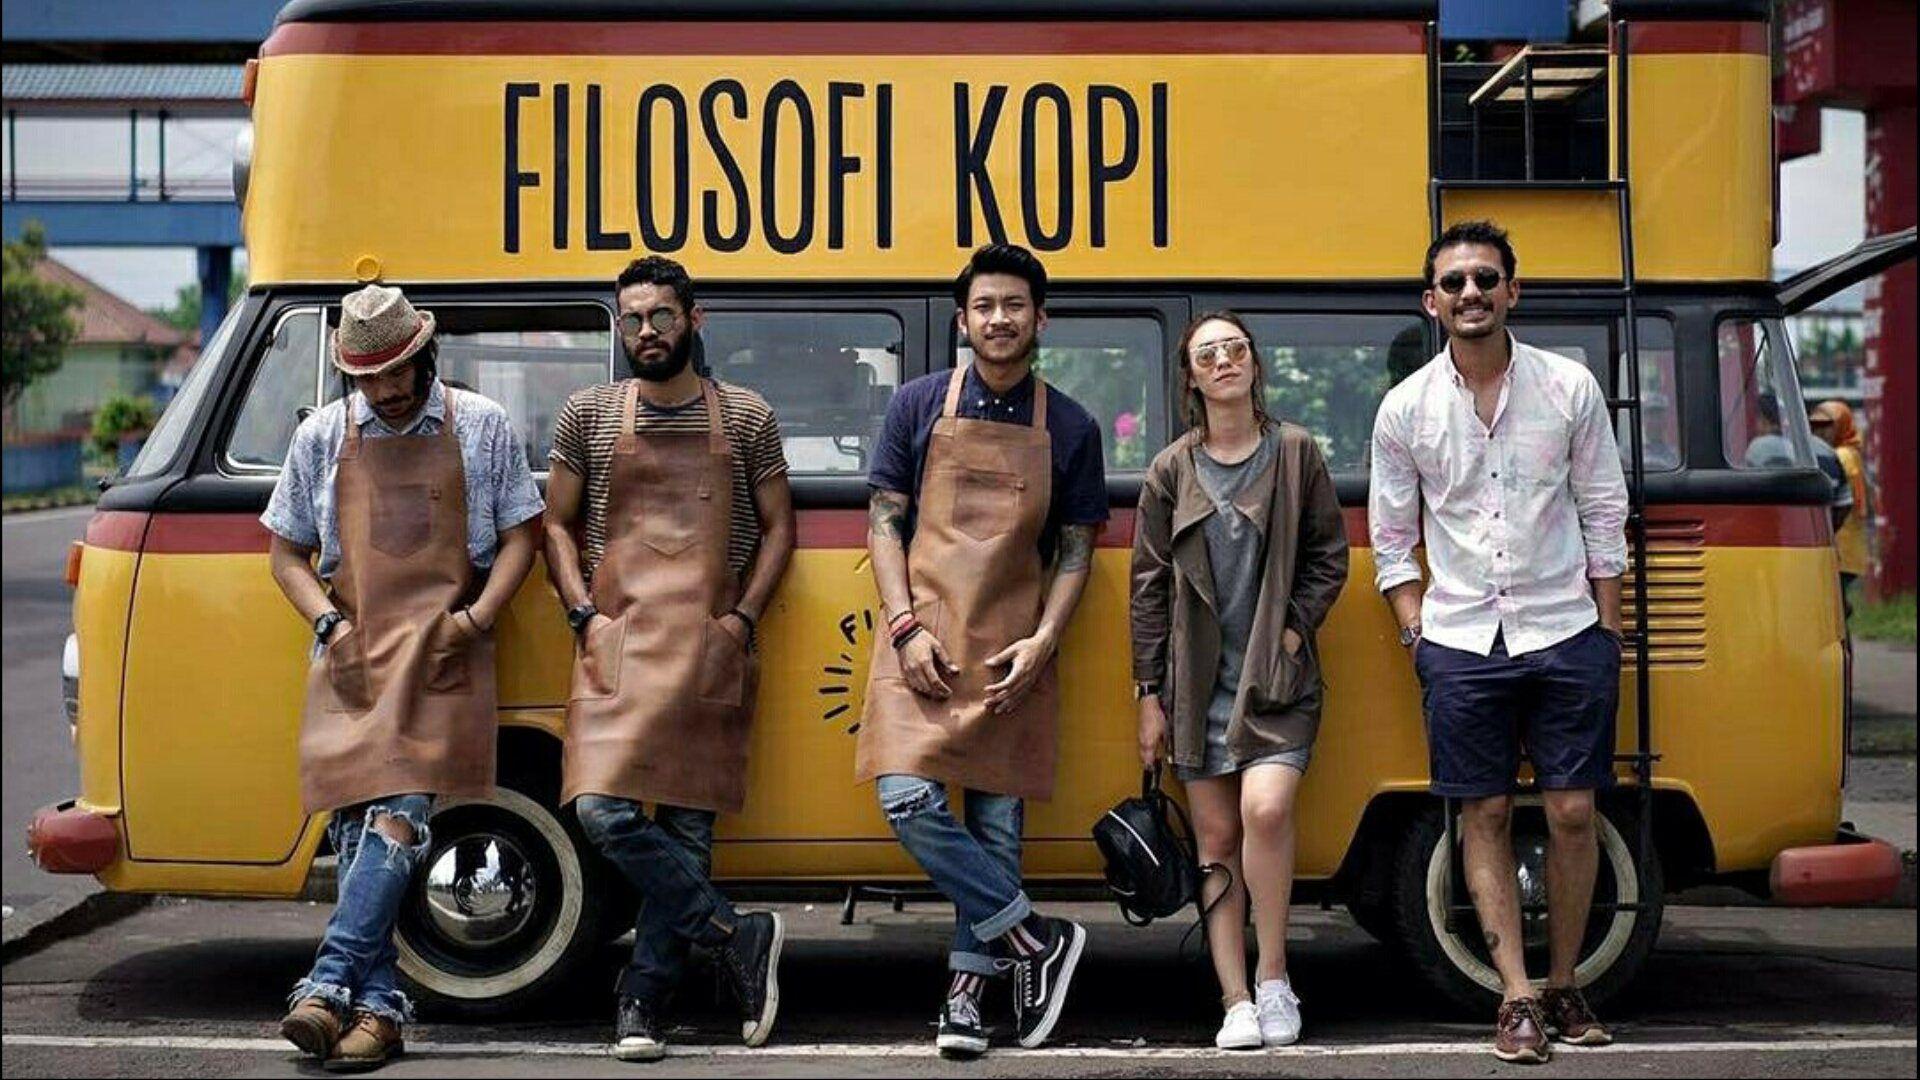 Watch Filosofi Kopi 2 Ben dan Jody Movie & TV Stream